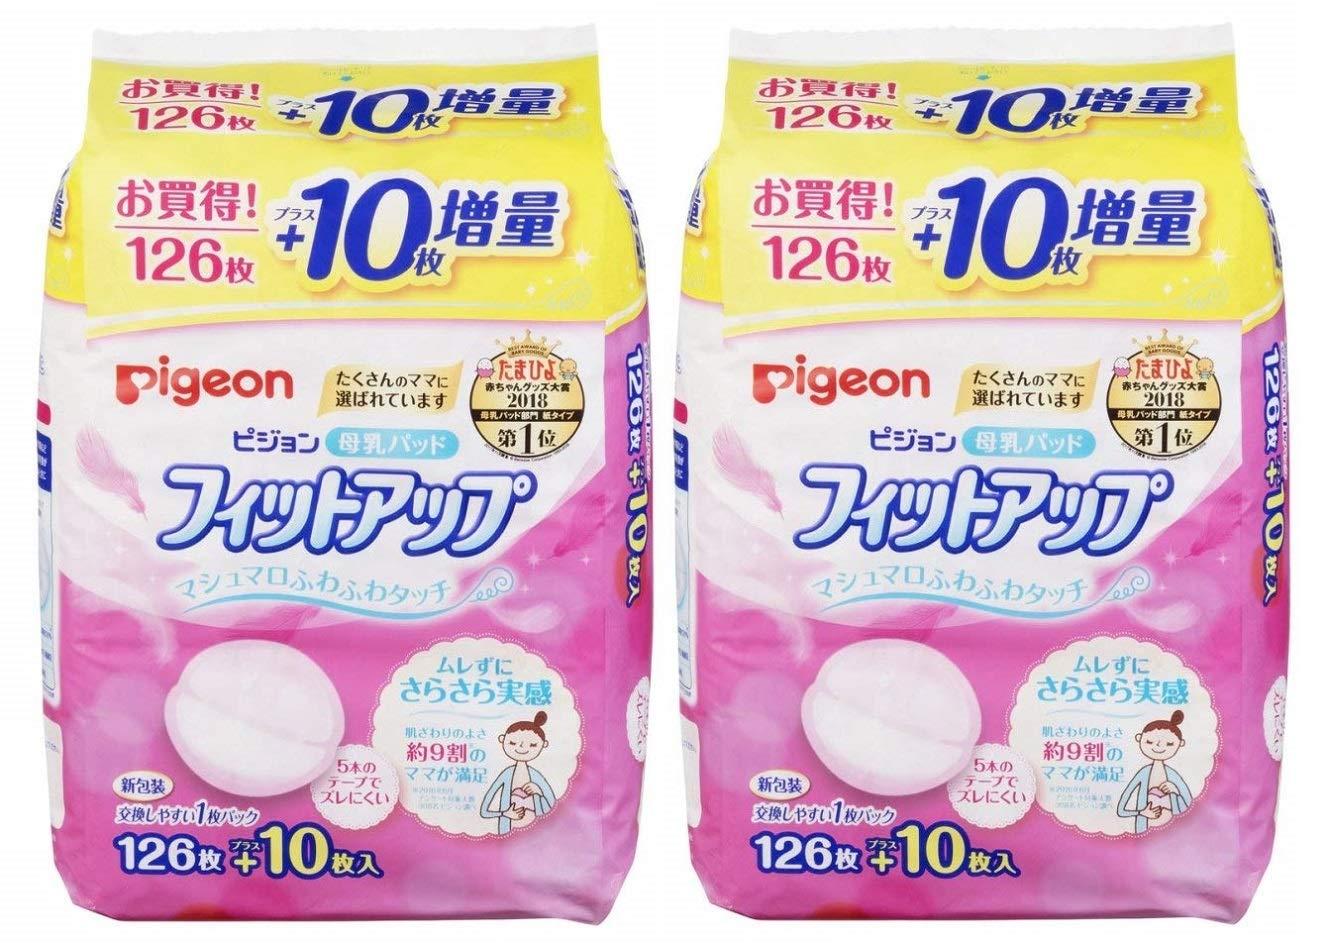 【Amazon.co.jp限定】 ピジョン 母乳パッド フィットアップ 126枚入×2個 母乳育児をする多くのママに選ばれている母乳パッド 0か月~